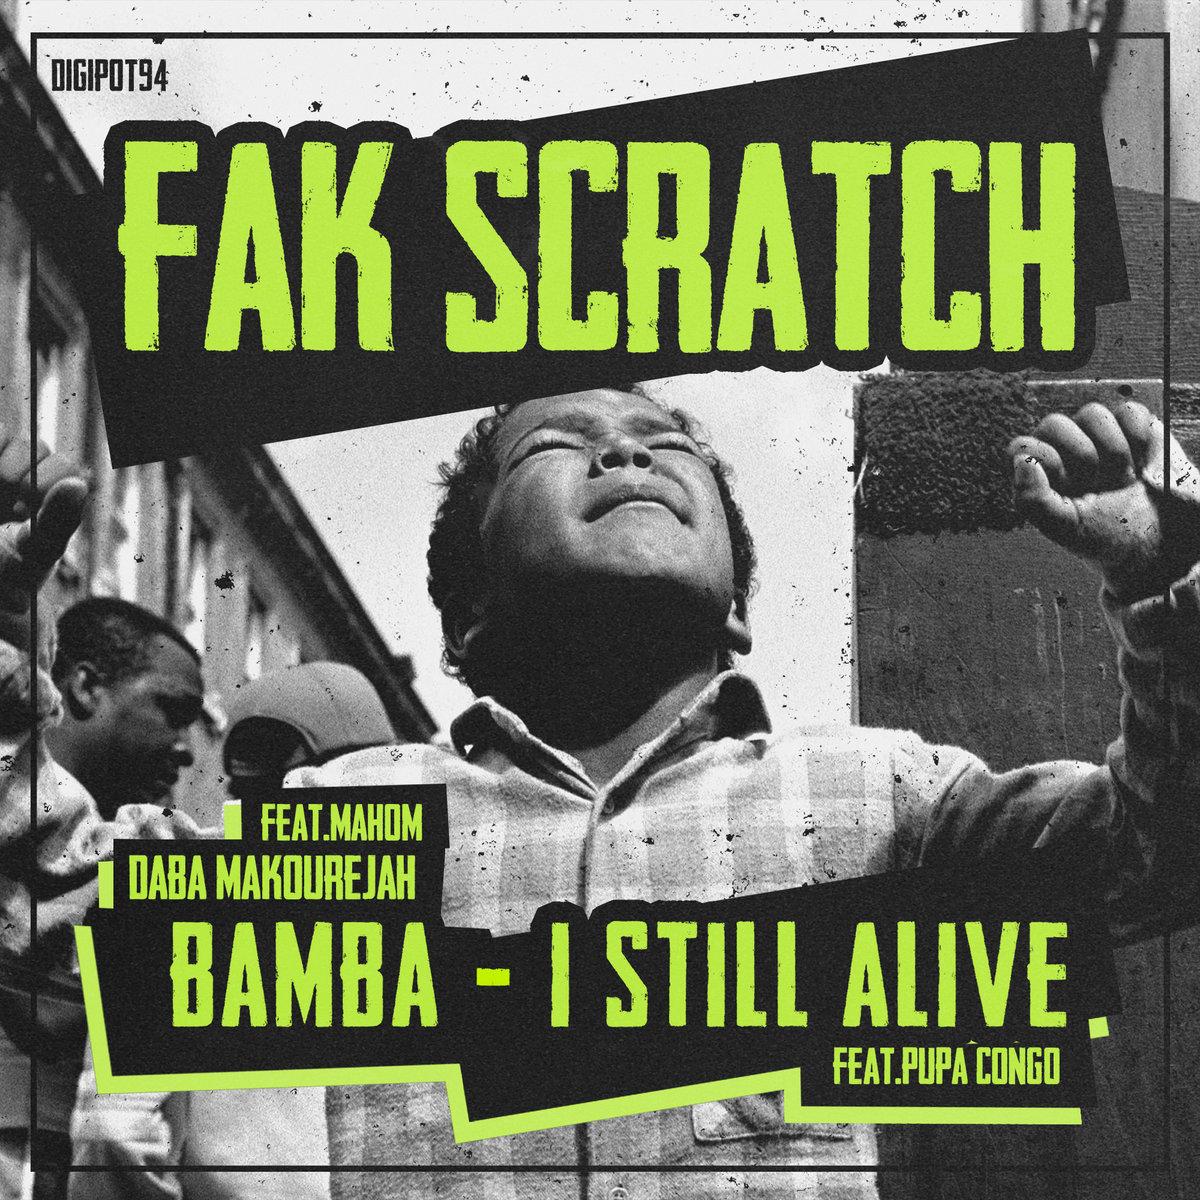 Bamba (Fak Scratch remix) | Daba Makourejah feat. Mahom | Melting Pot  Records